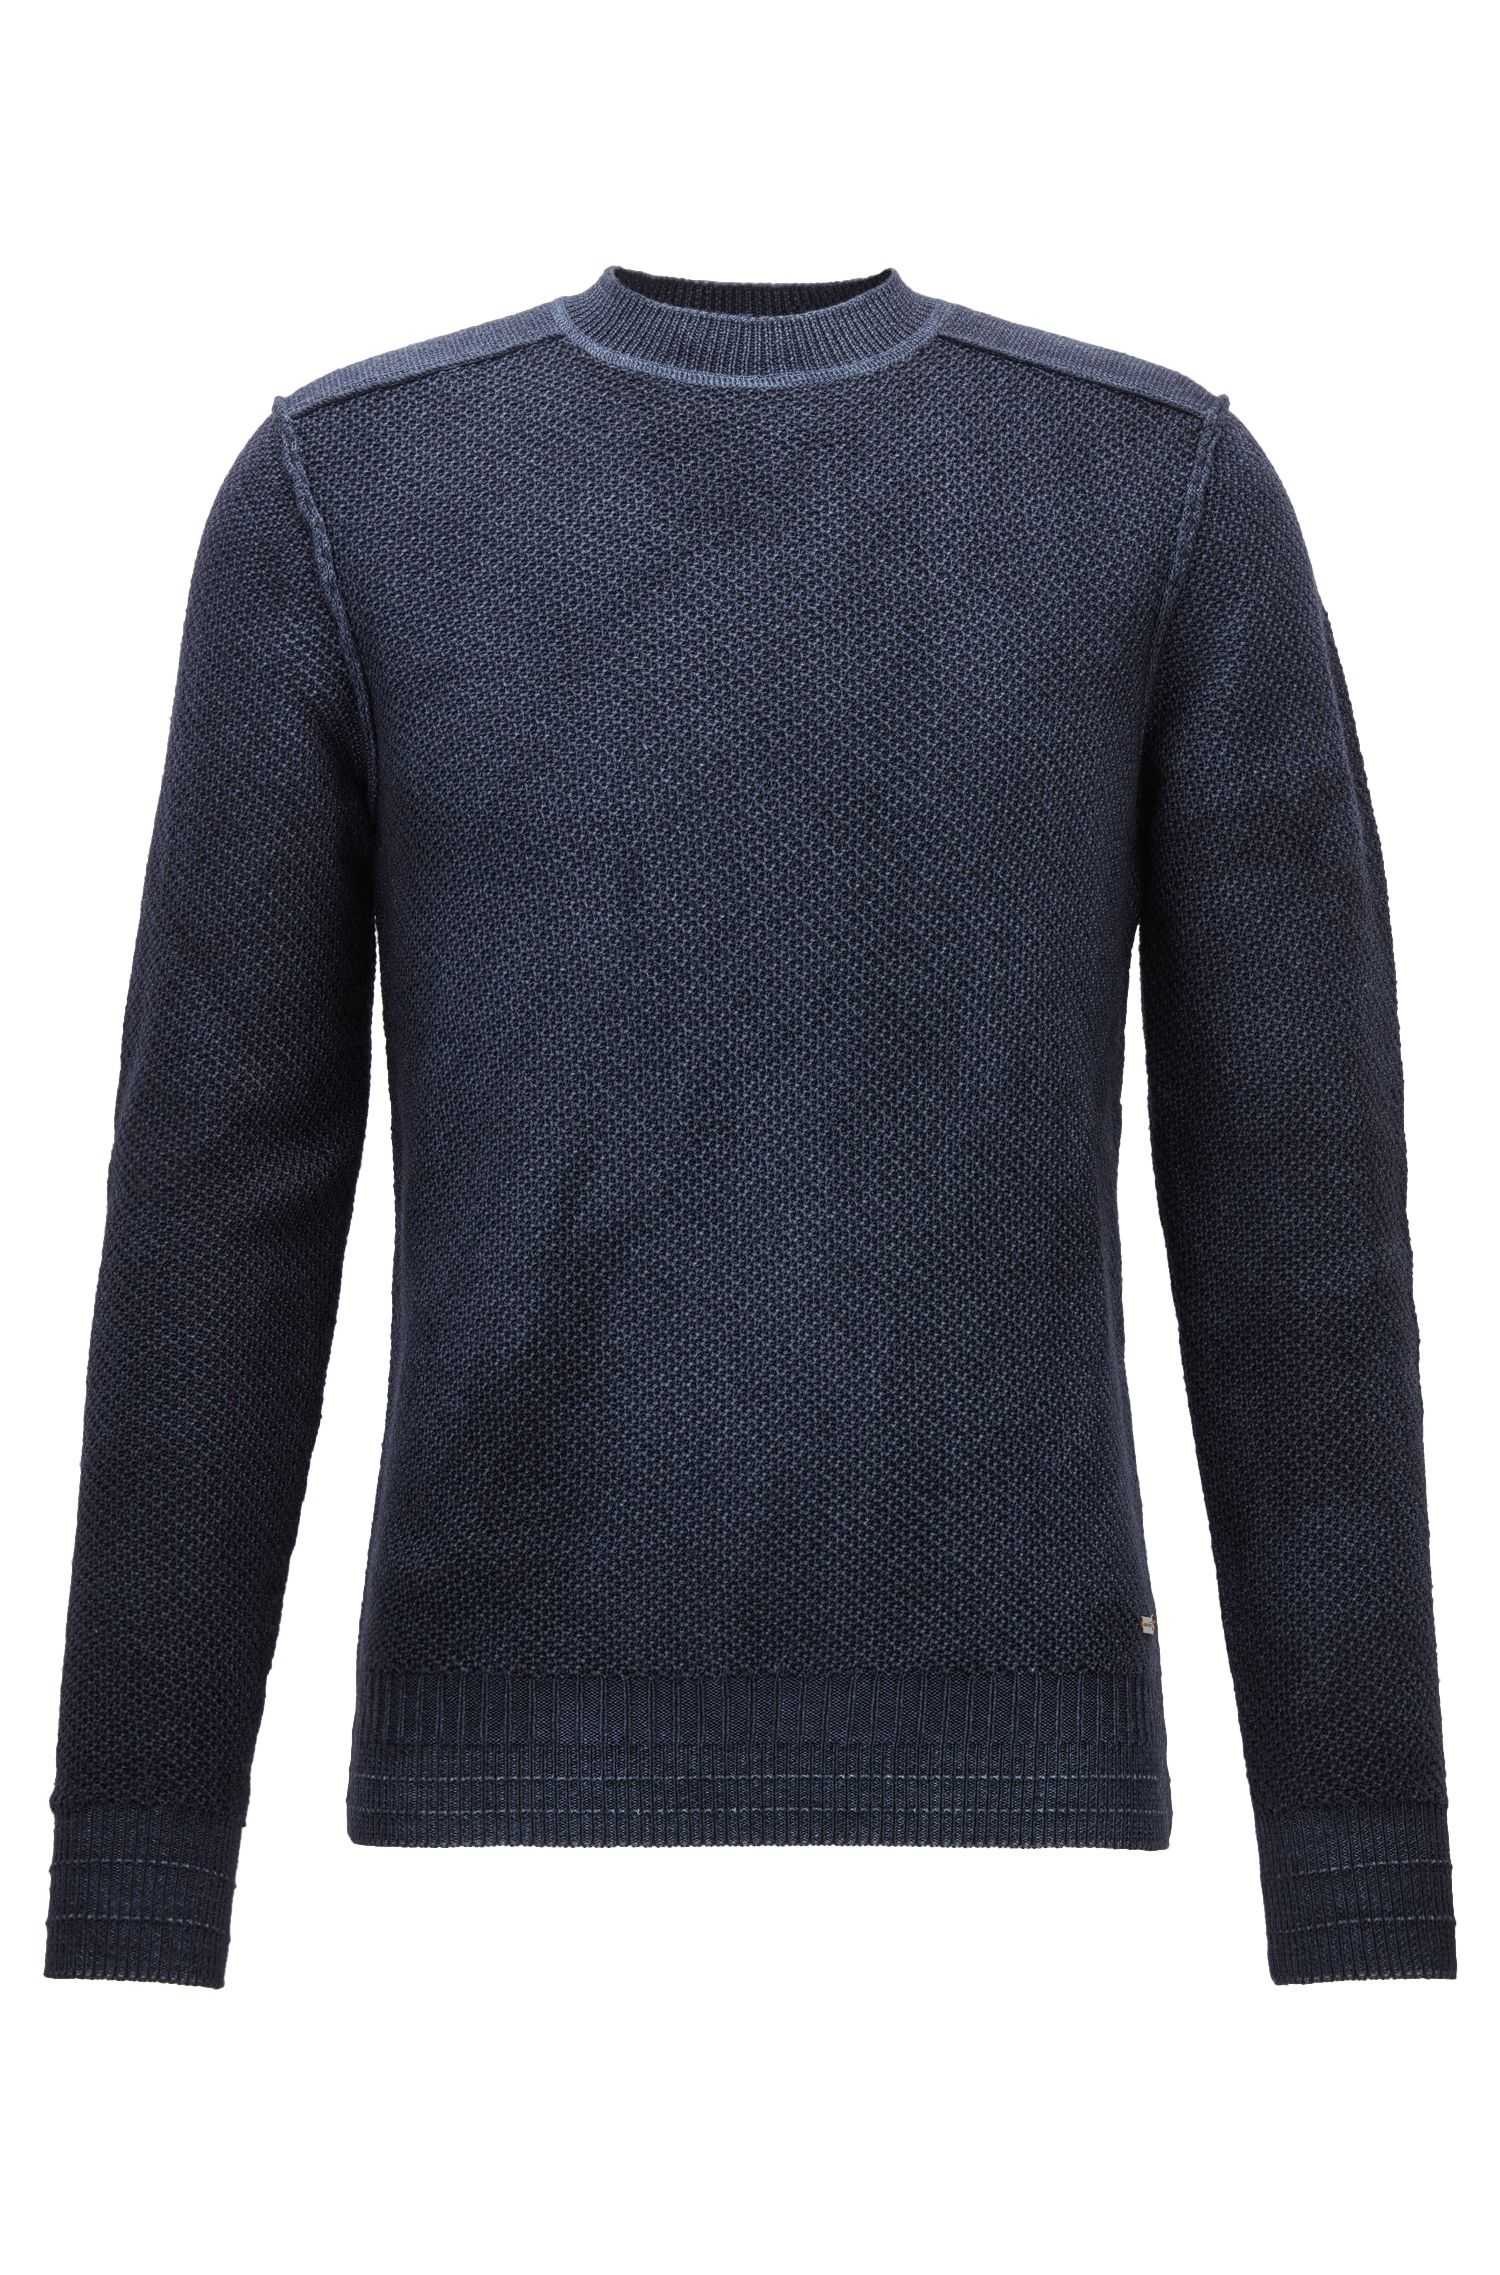 'Kalmut' | Virgin Merino Wool Sweater, Dark Blue